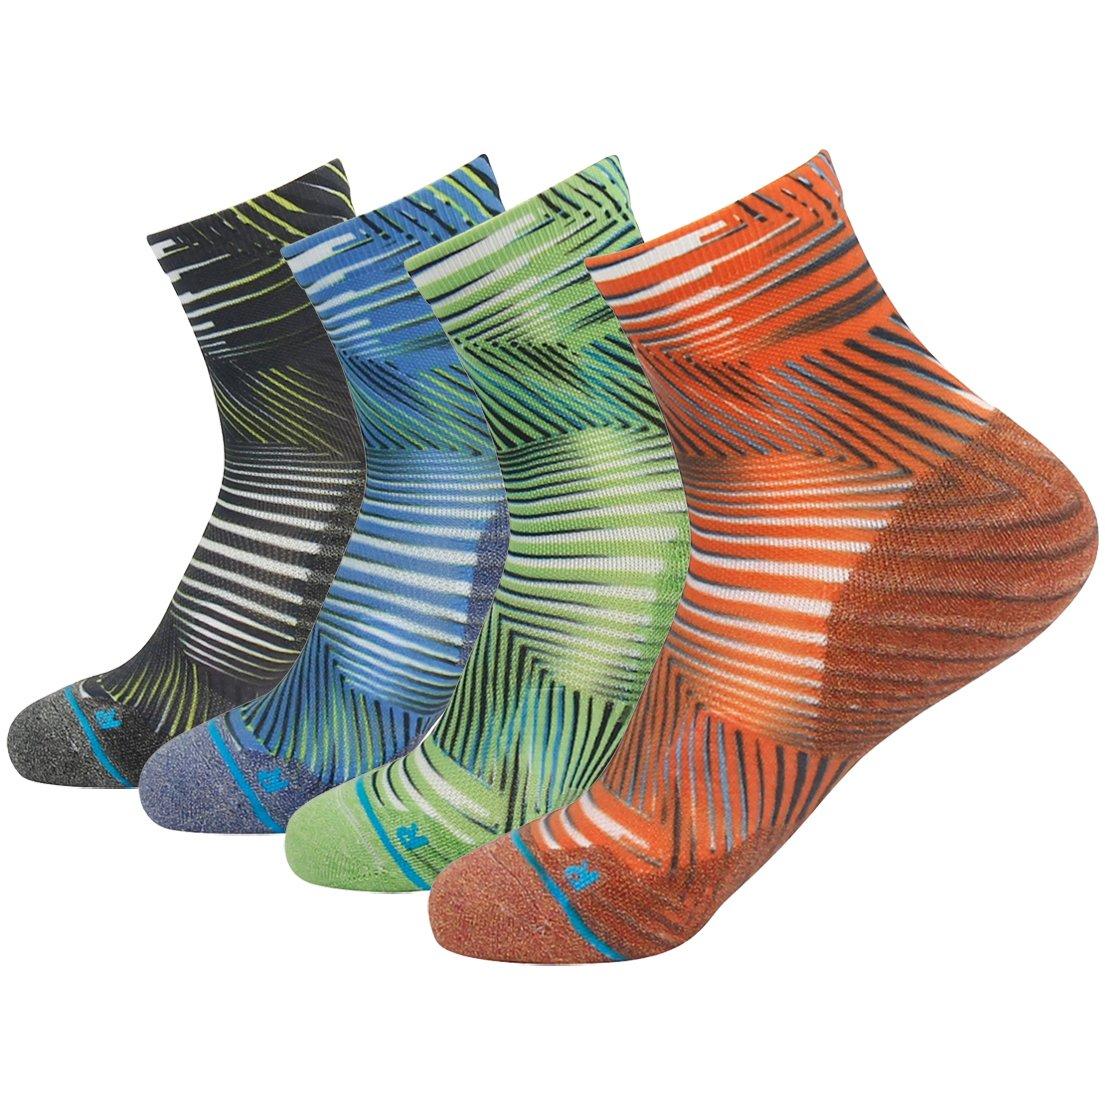 HUSO Men Women Performance Novelty Cushion Athletic Hiking Running Crew Socks 1,4,6 Pair Multi Color